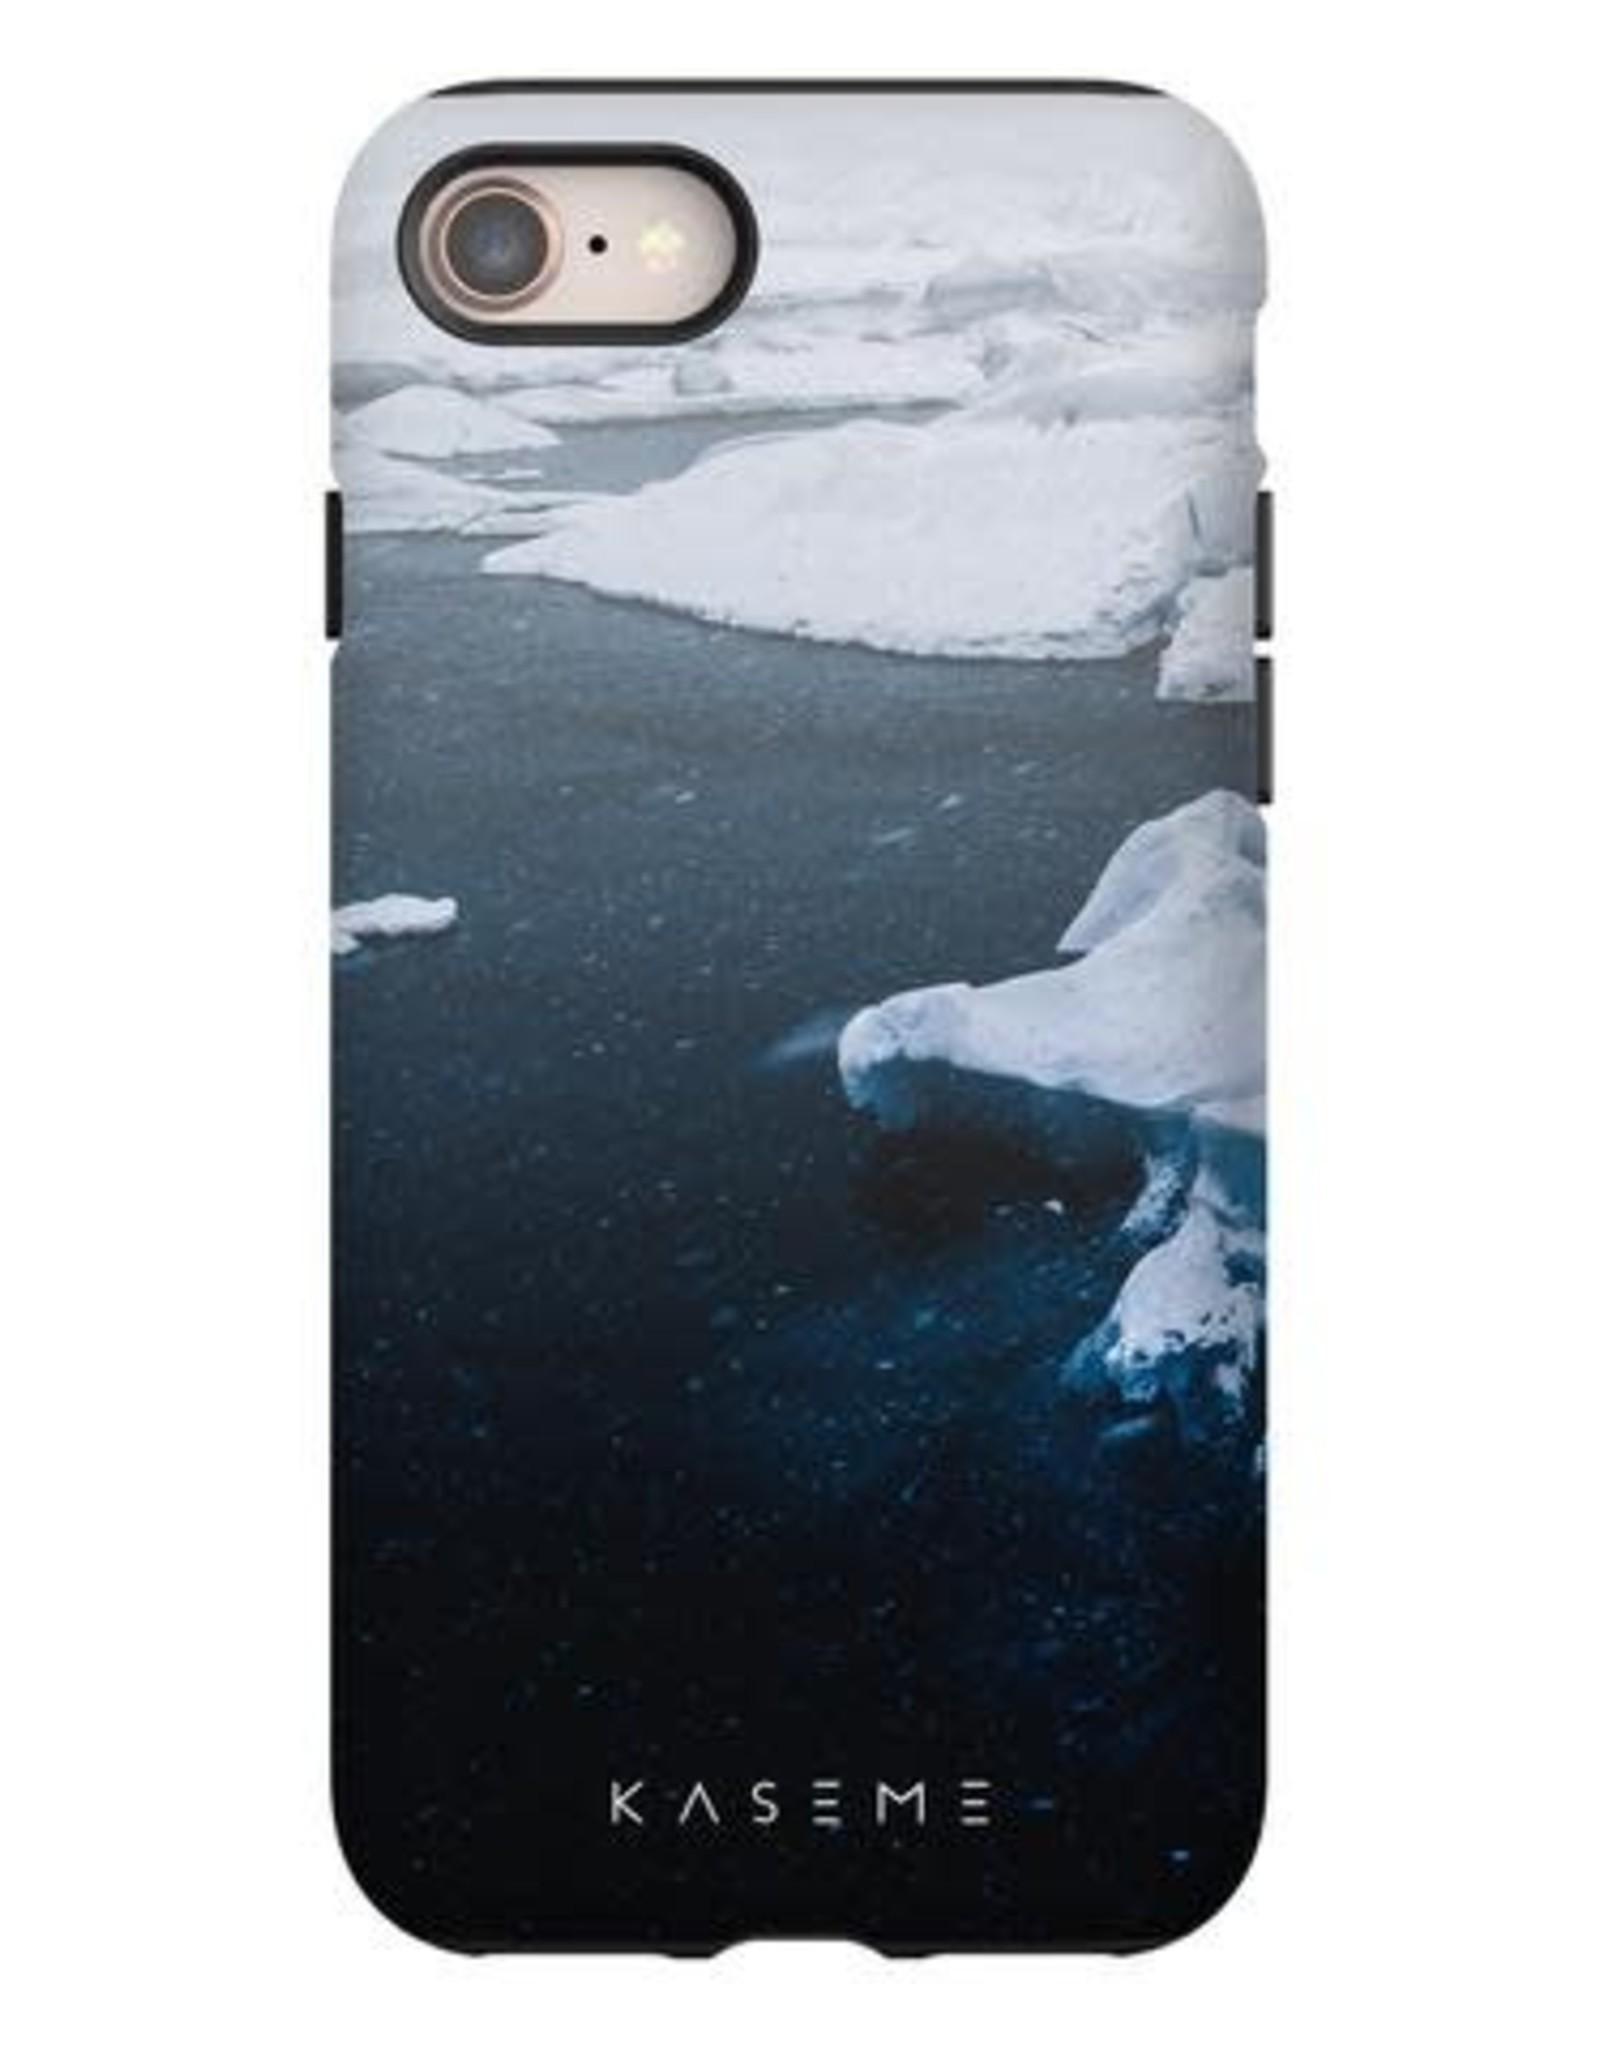 Kaseme Kaseme - étui cellulaire iPhone iceberg